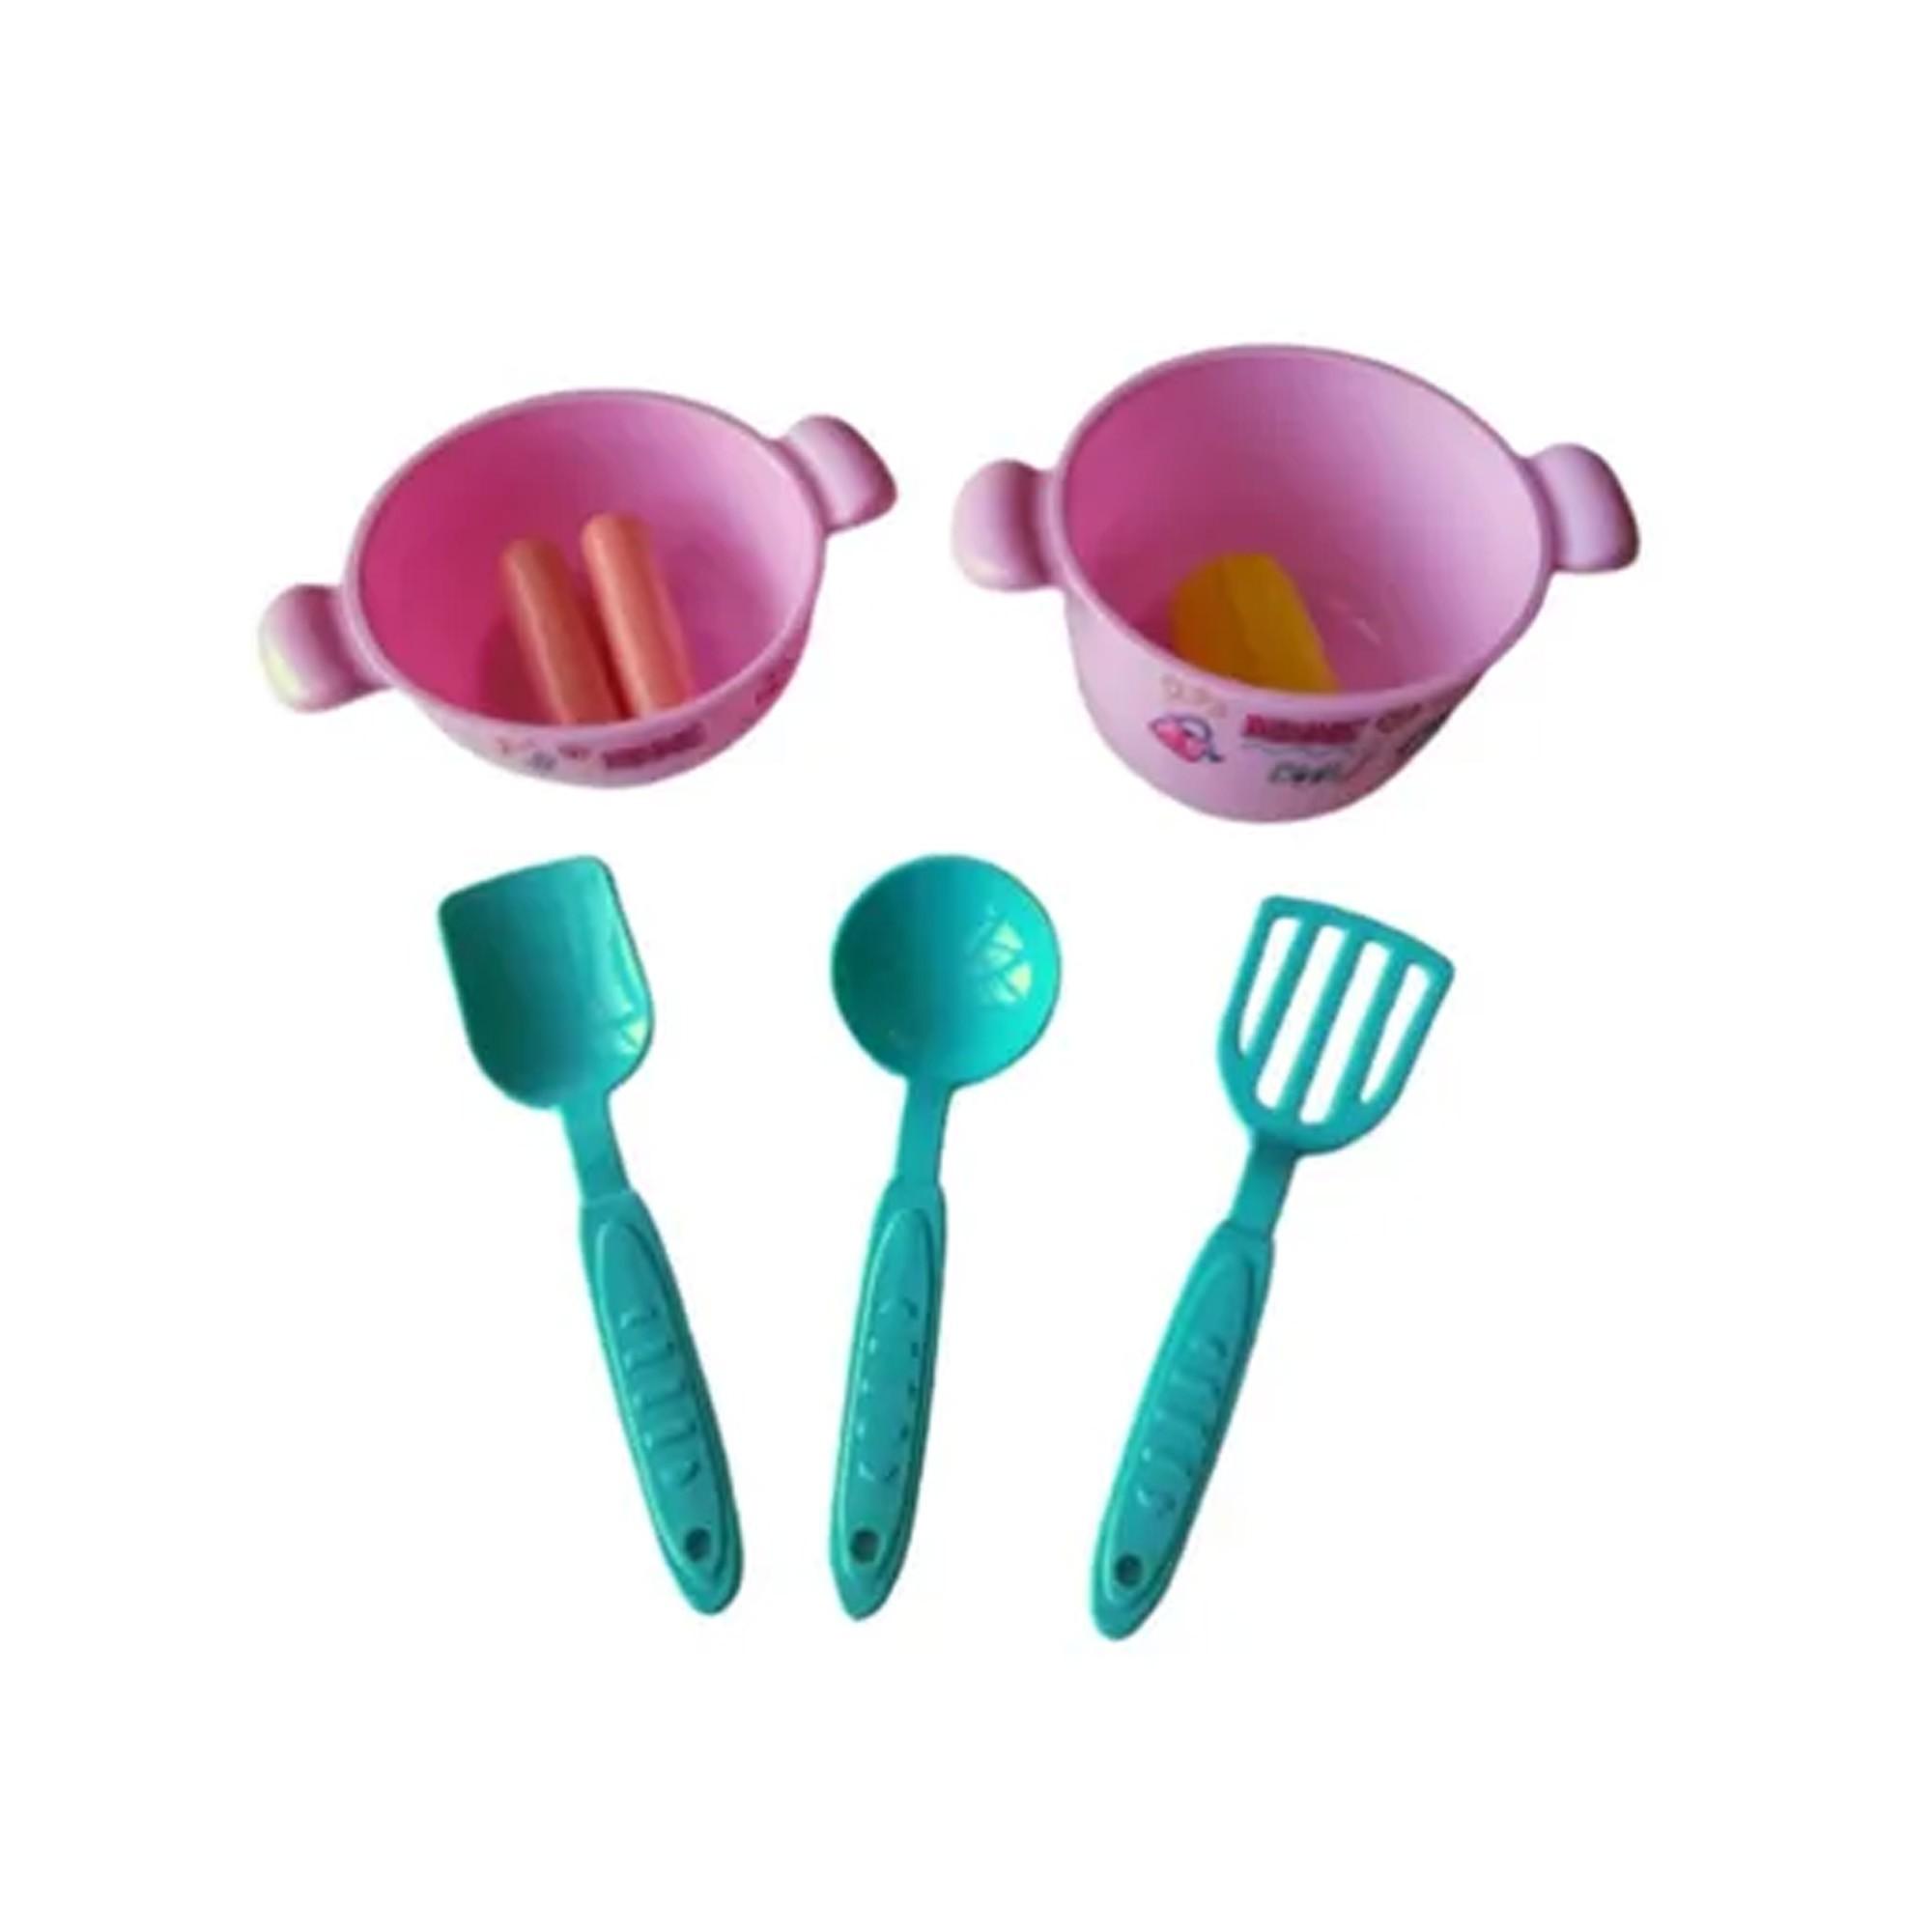 Kit Comidinha Infantil Panelinhas Acessórios Minnie Disney - Mielle